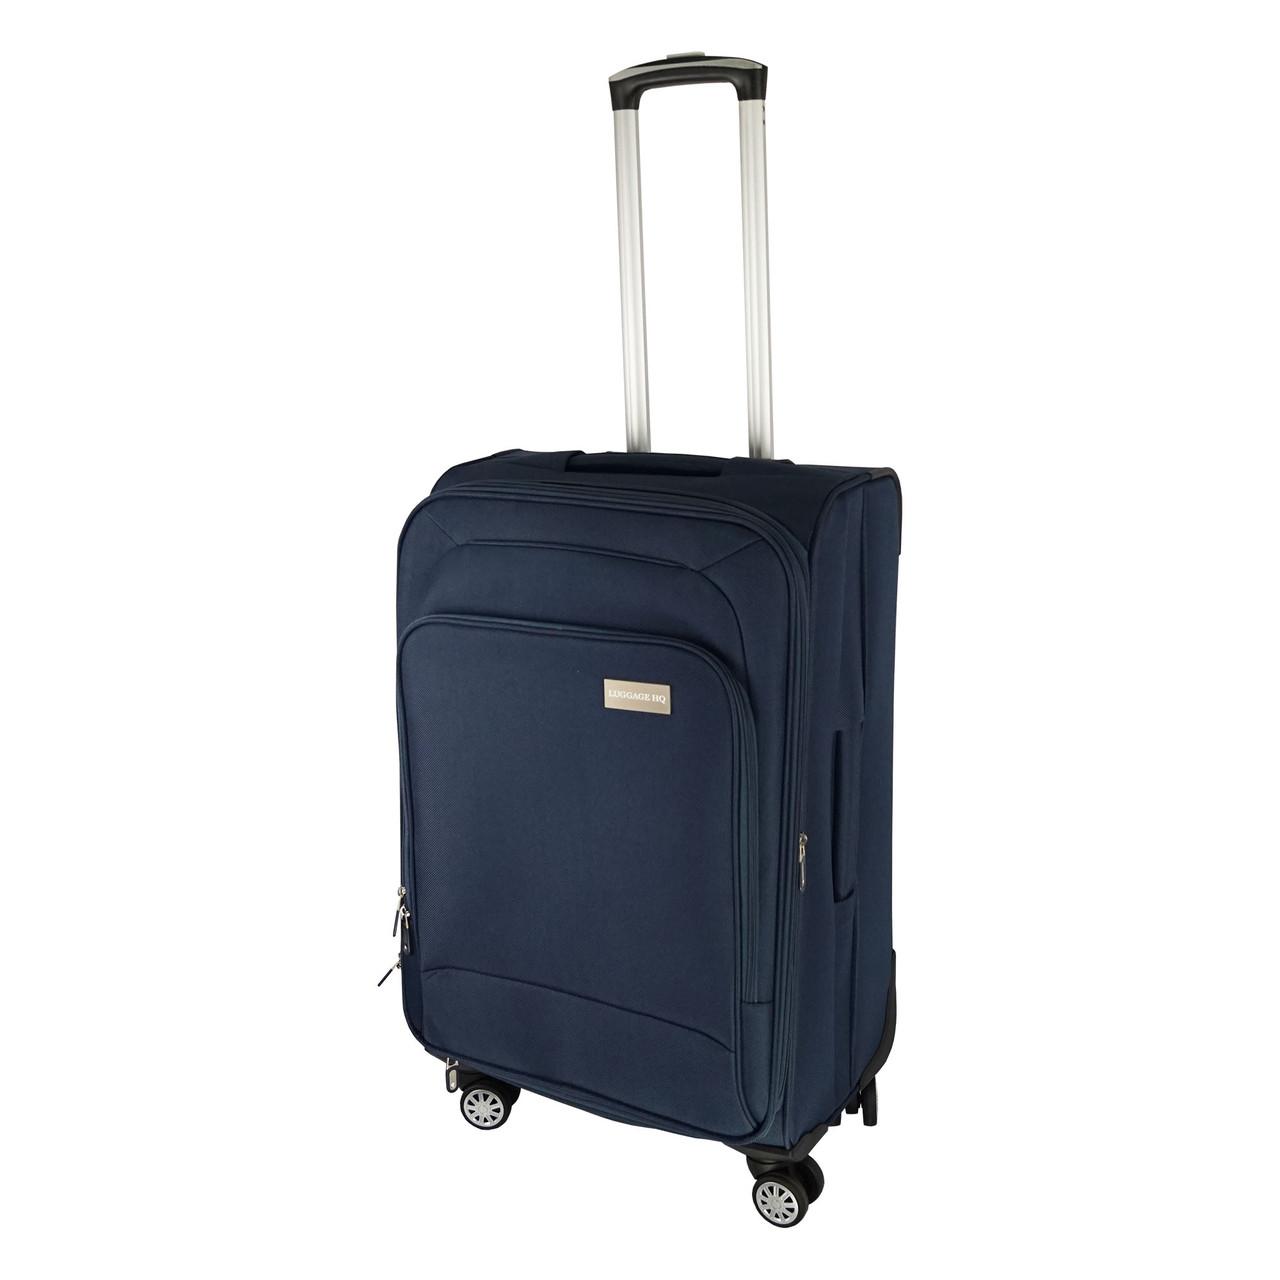 Чемодан на колесиках Luggage HQ (77х45 см) большой, синий